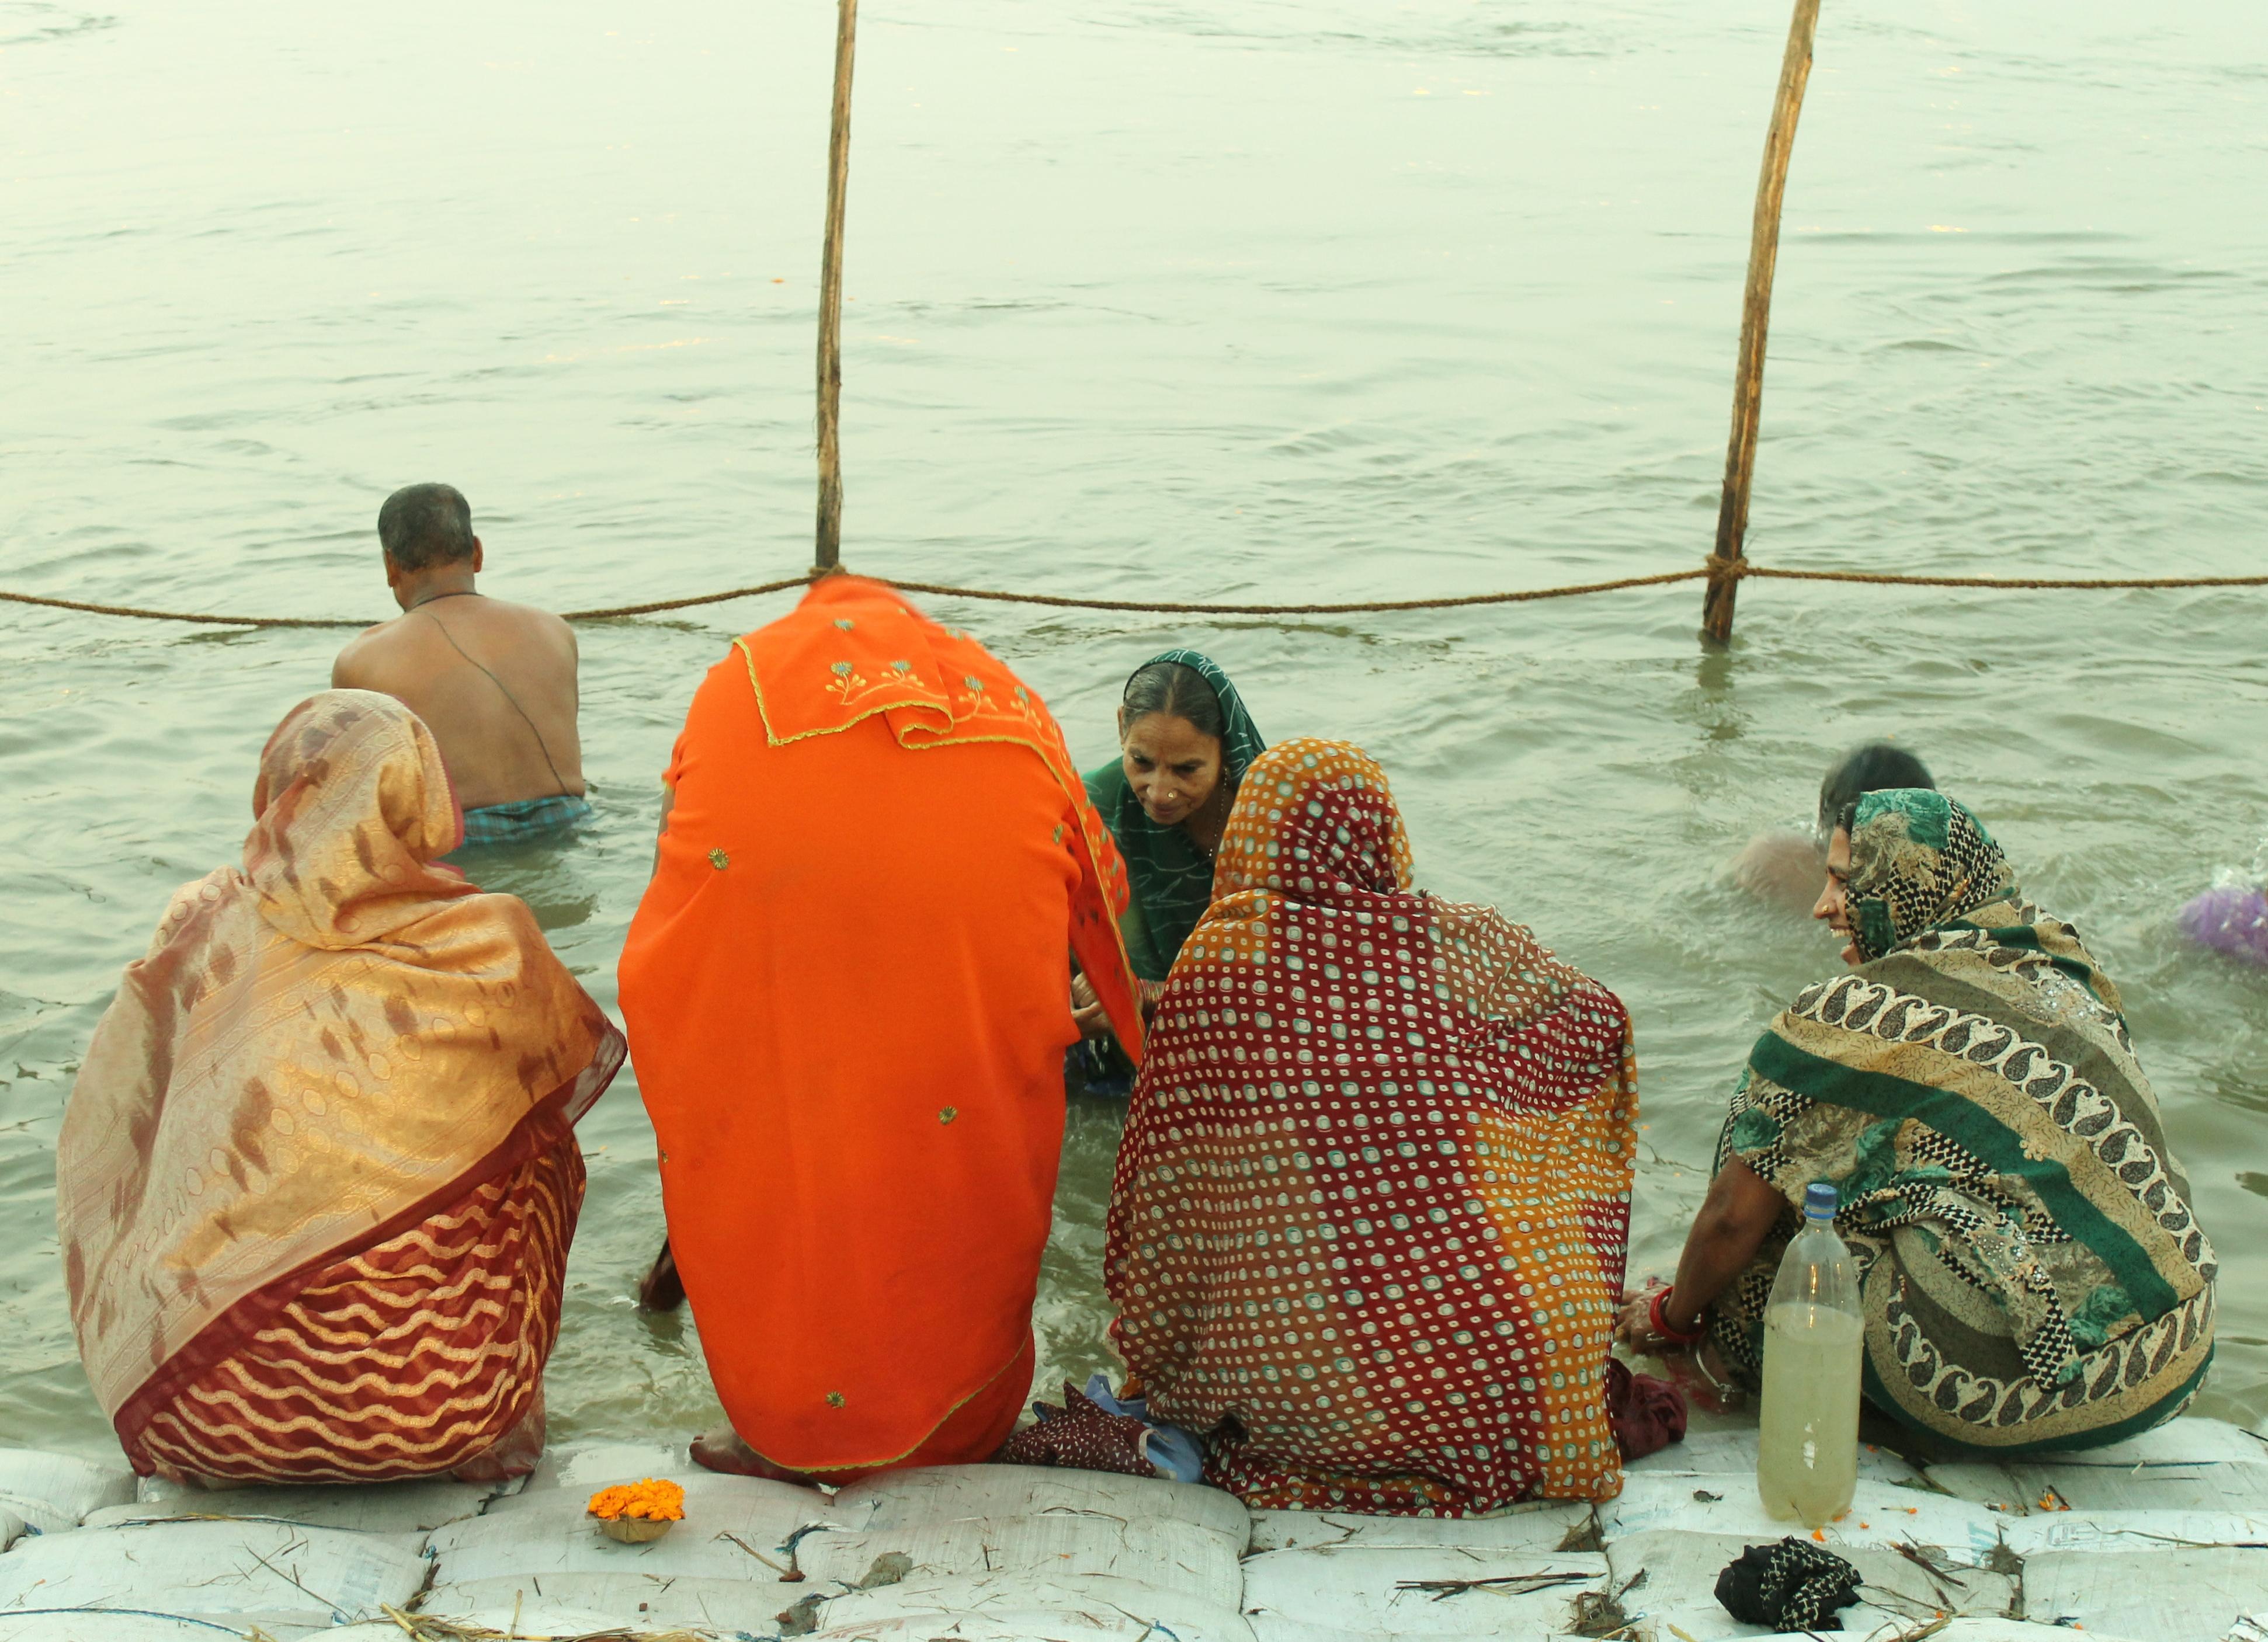 Kumbh Mela India - women about to take a dip